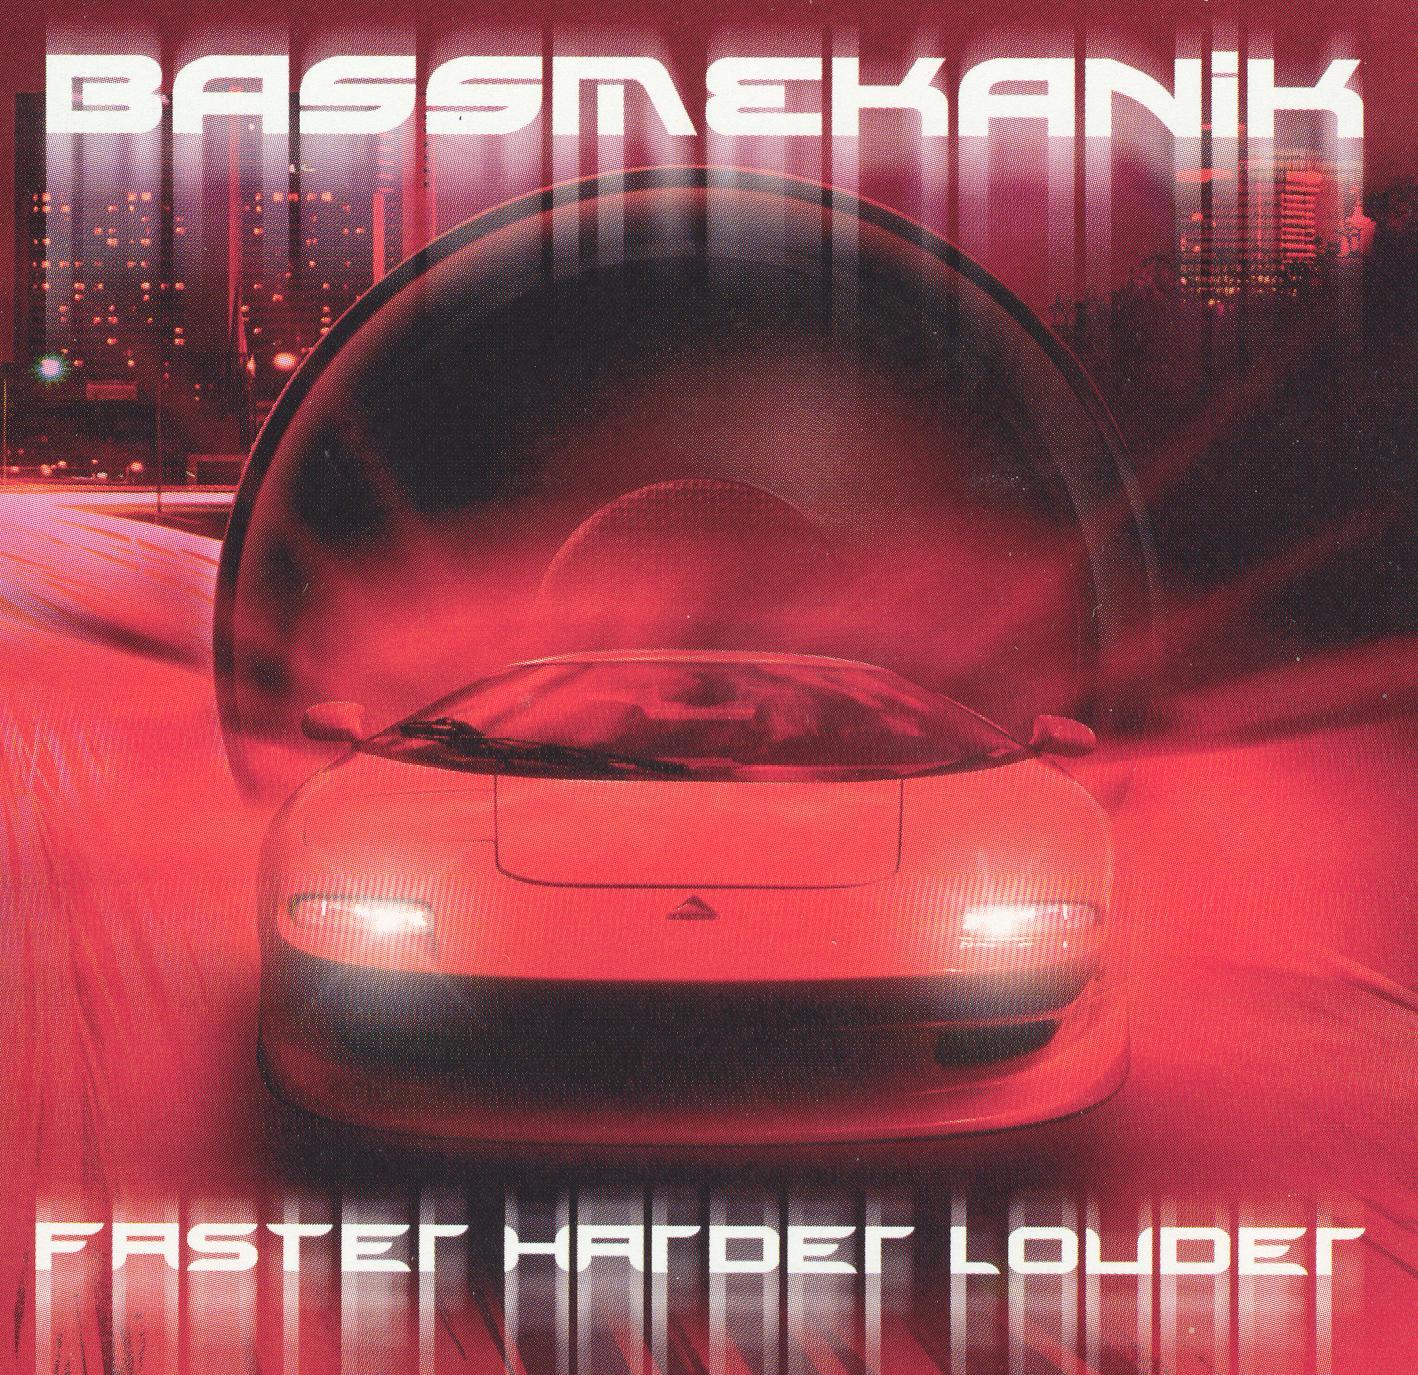 Bass Mekanik: Faster Harder Louder